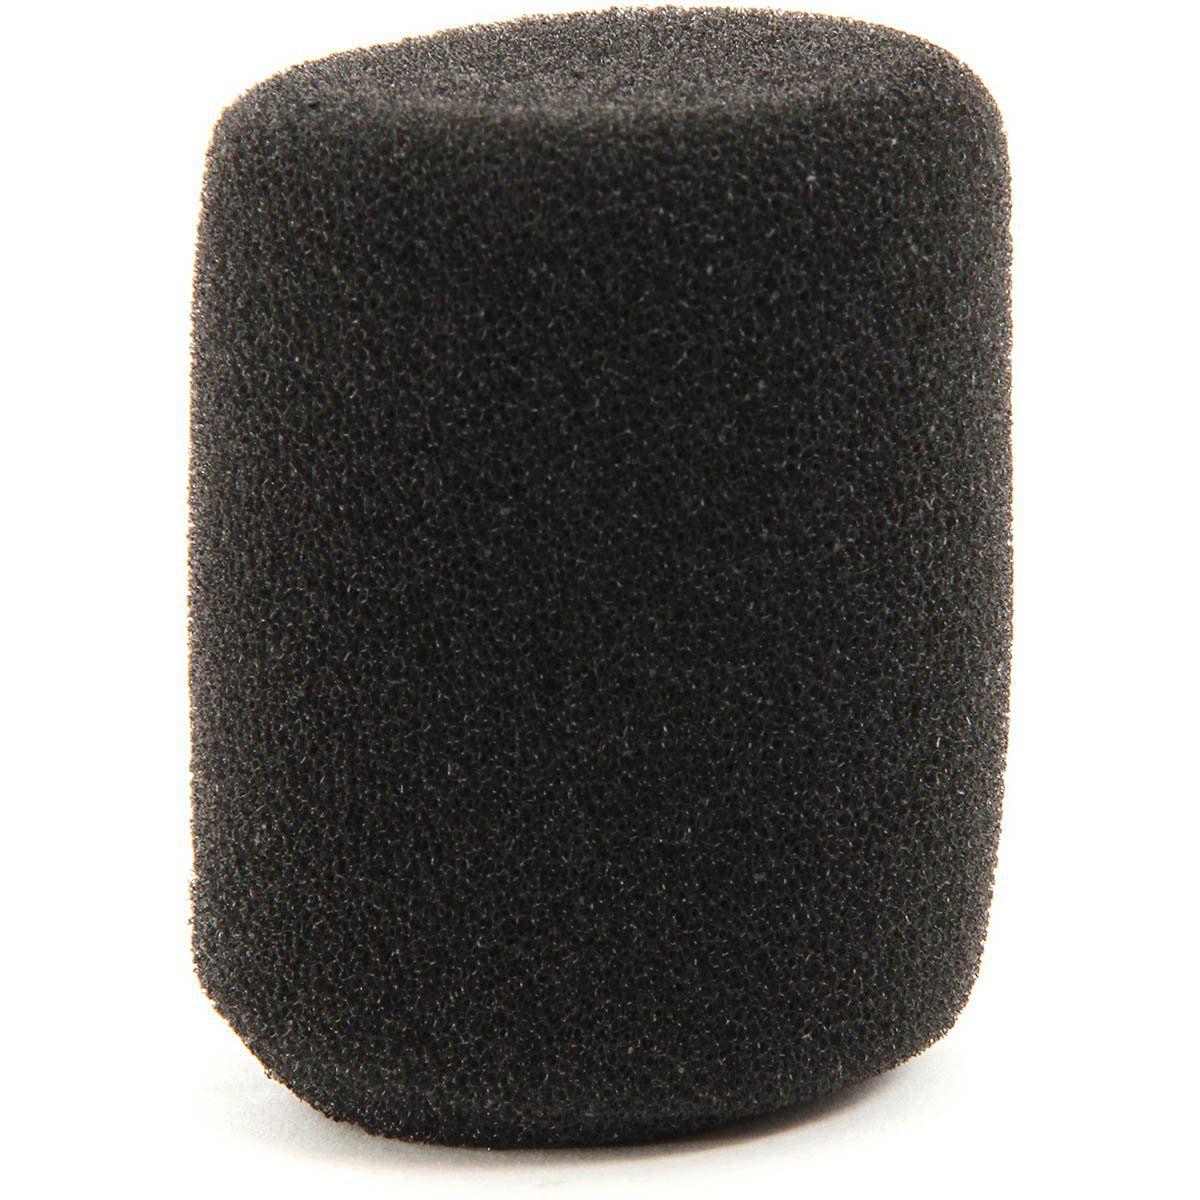 Akg C1000S Microfone Condensador Akg-C1000S Diafragma Pequeno para Voz e Instrumentos